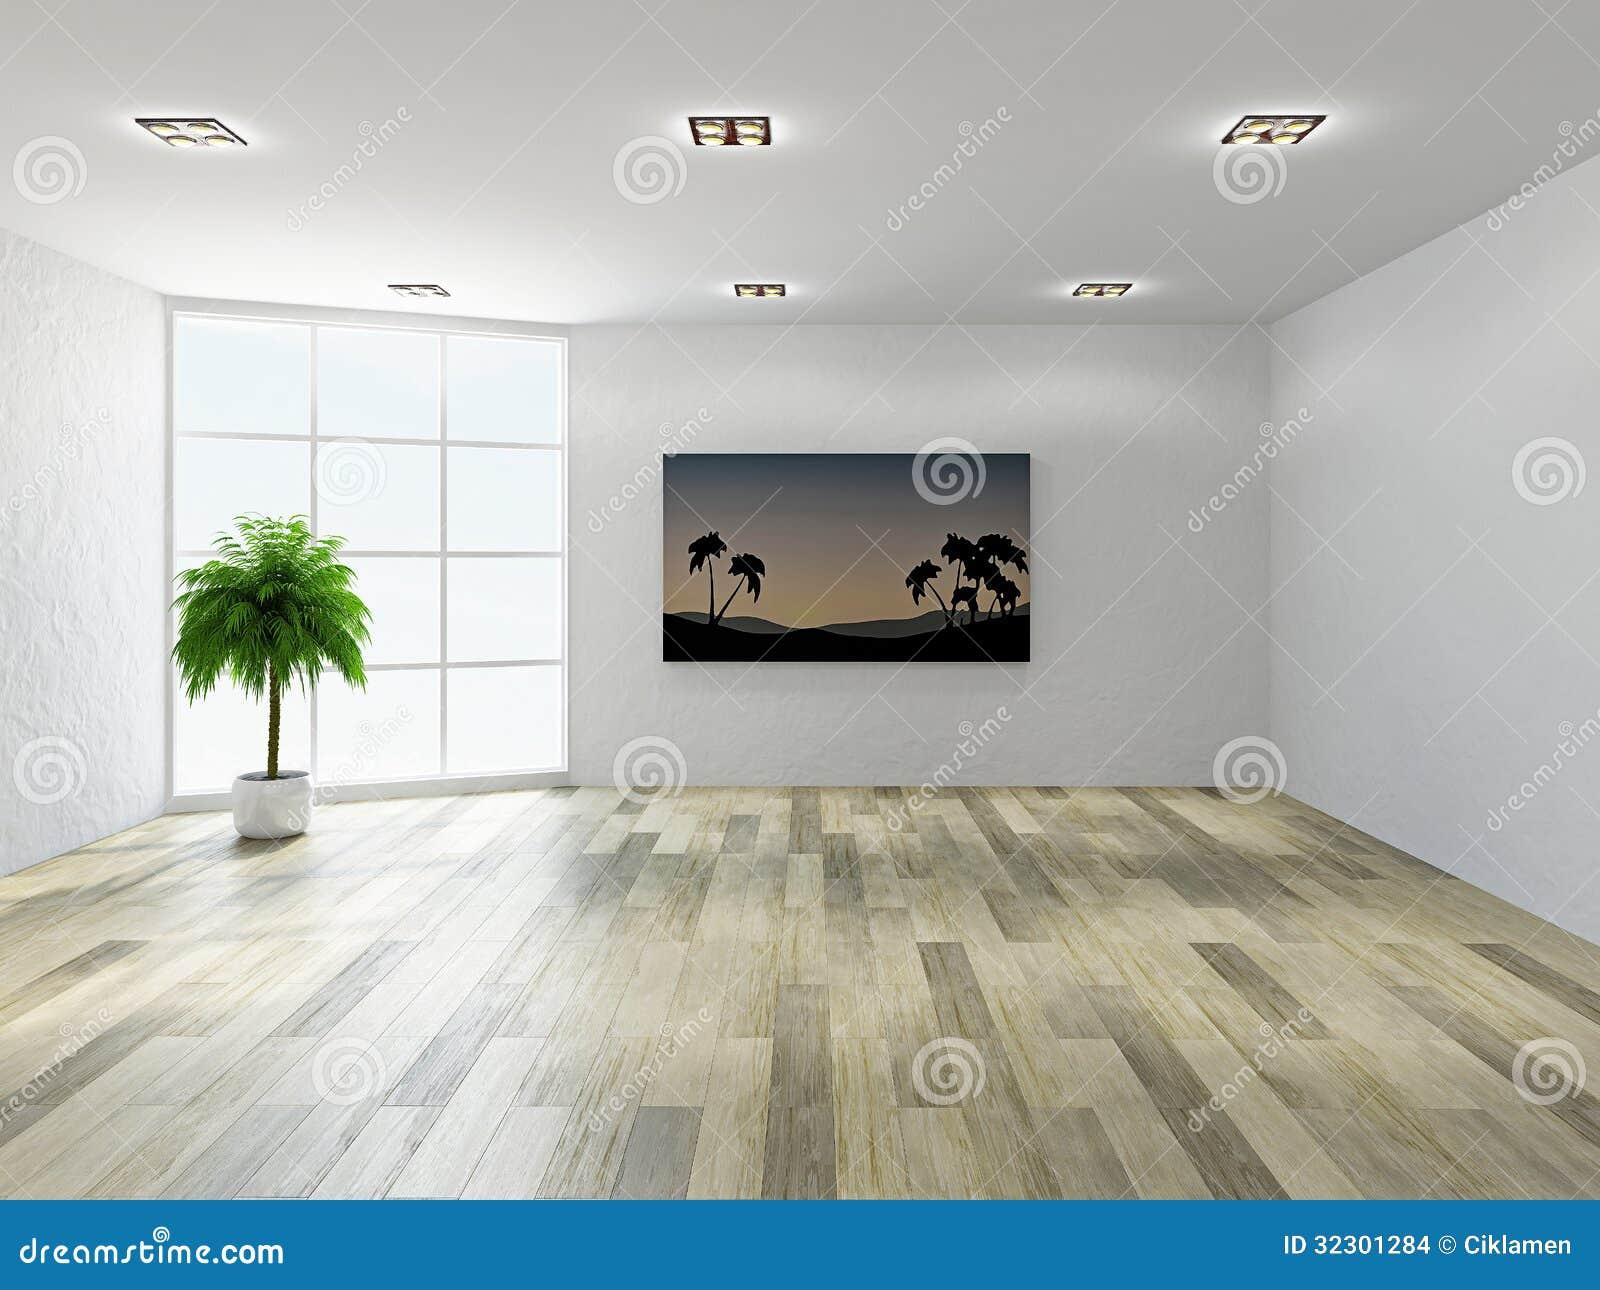 leerer raum mit fenstern stockbilder bild 32301284. Black Bedroom Furniture Sets. Home Design Ideas